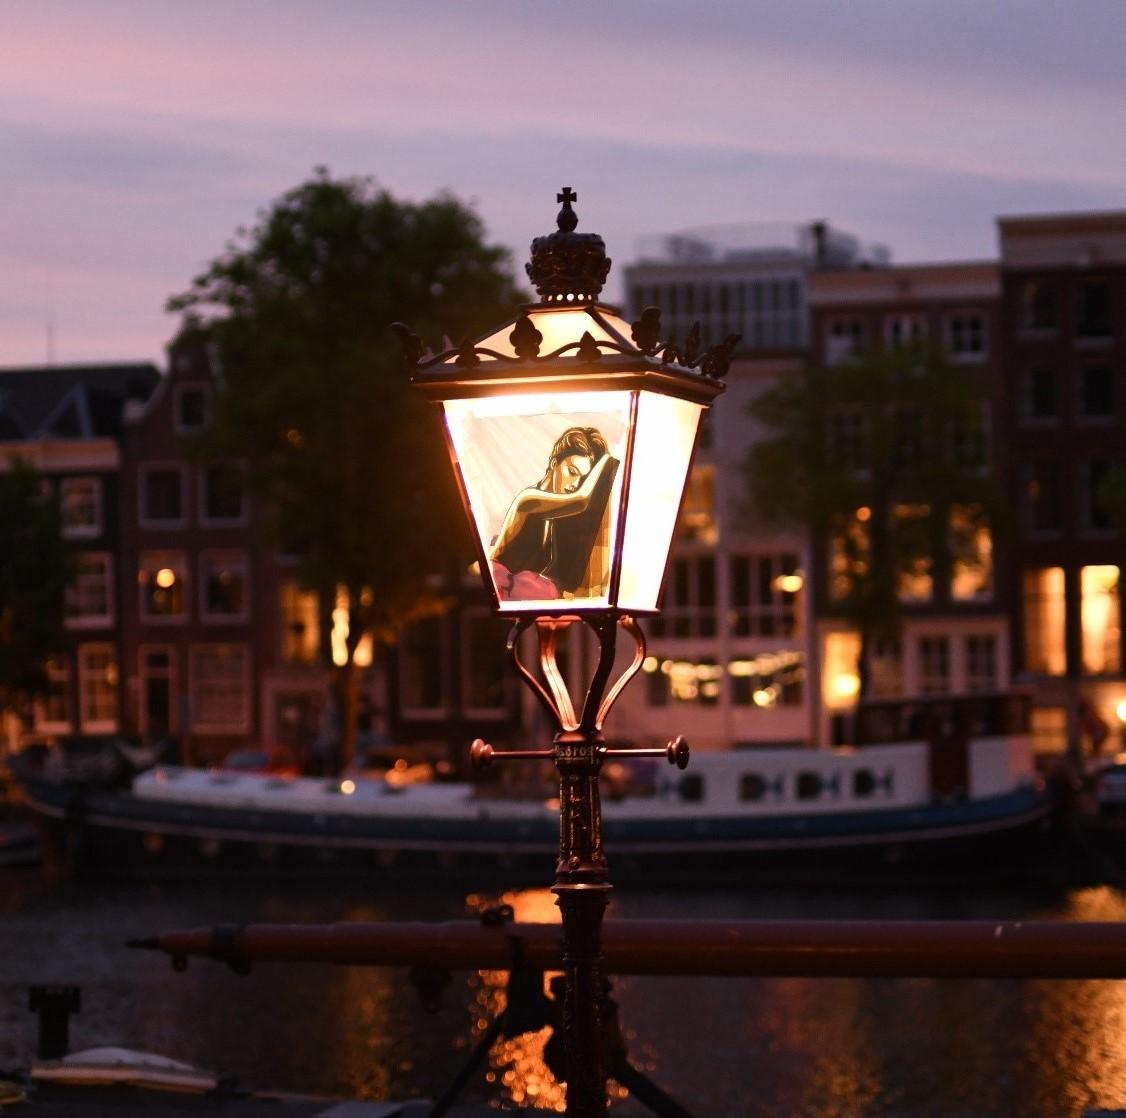 Tape Art Sticker on street lamp in Amsterdam by Max Zorn